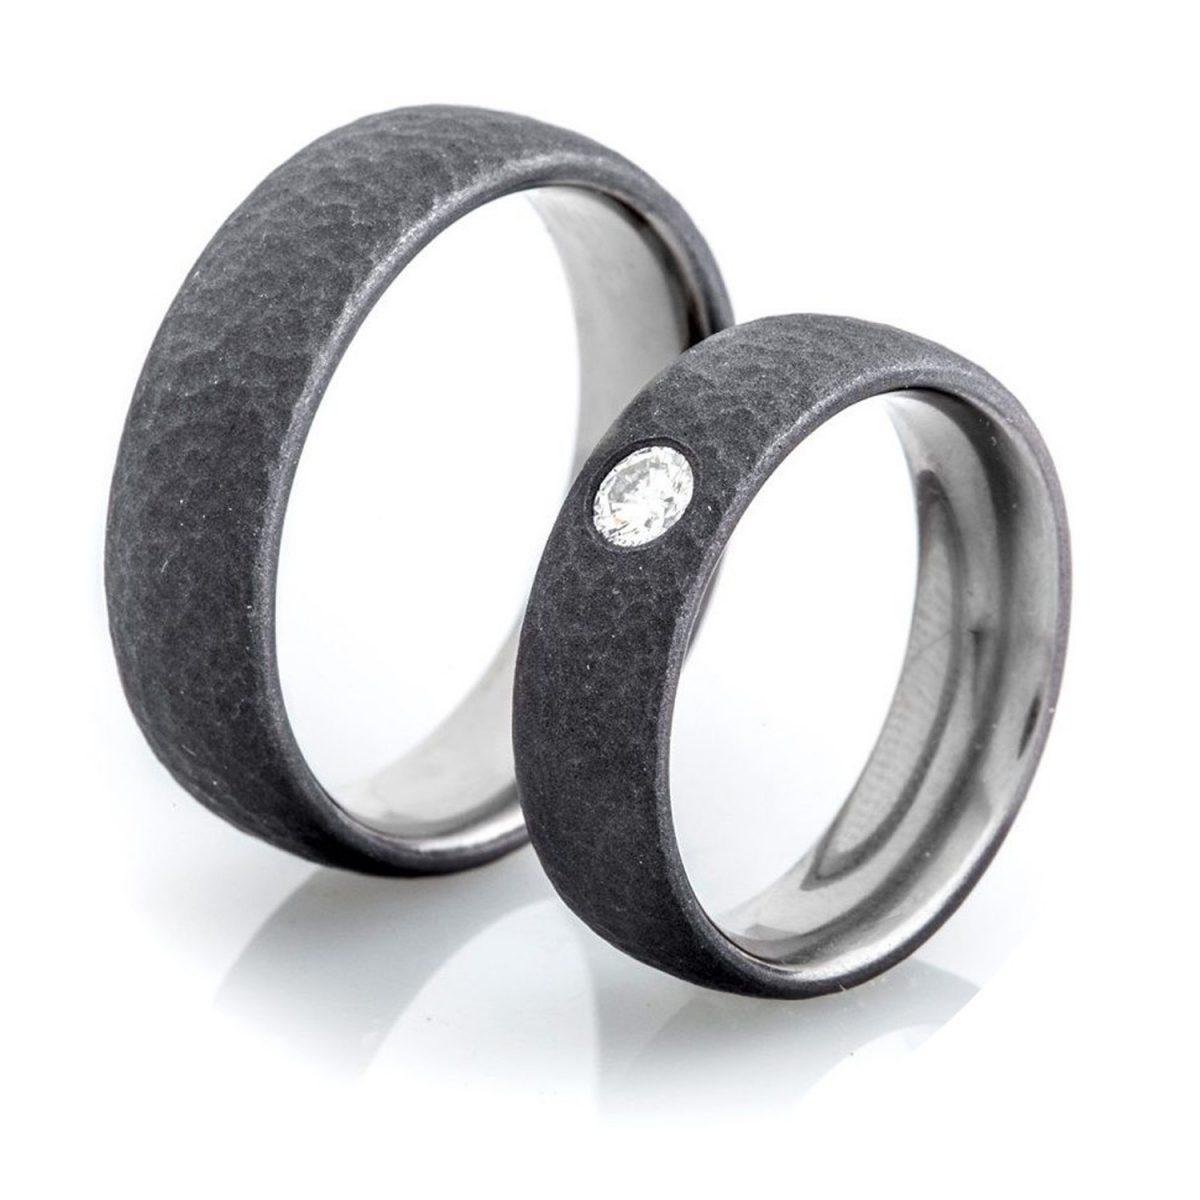 Tantal Paarringe   Ringpaar True Love Collection No:12